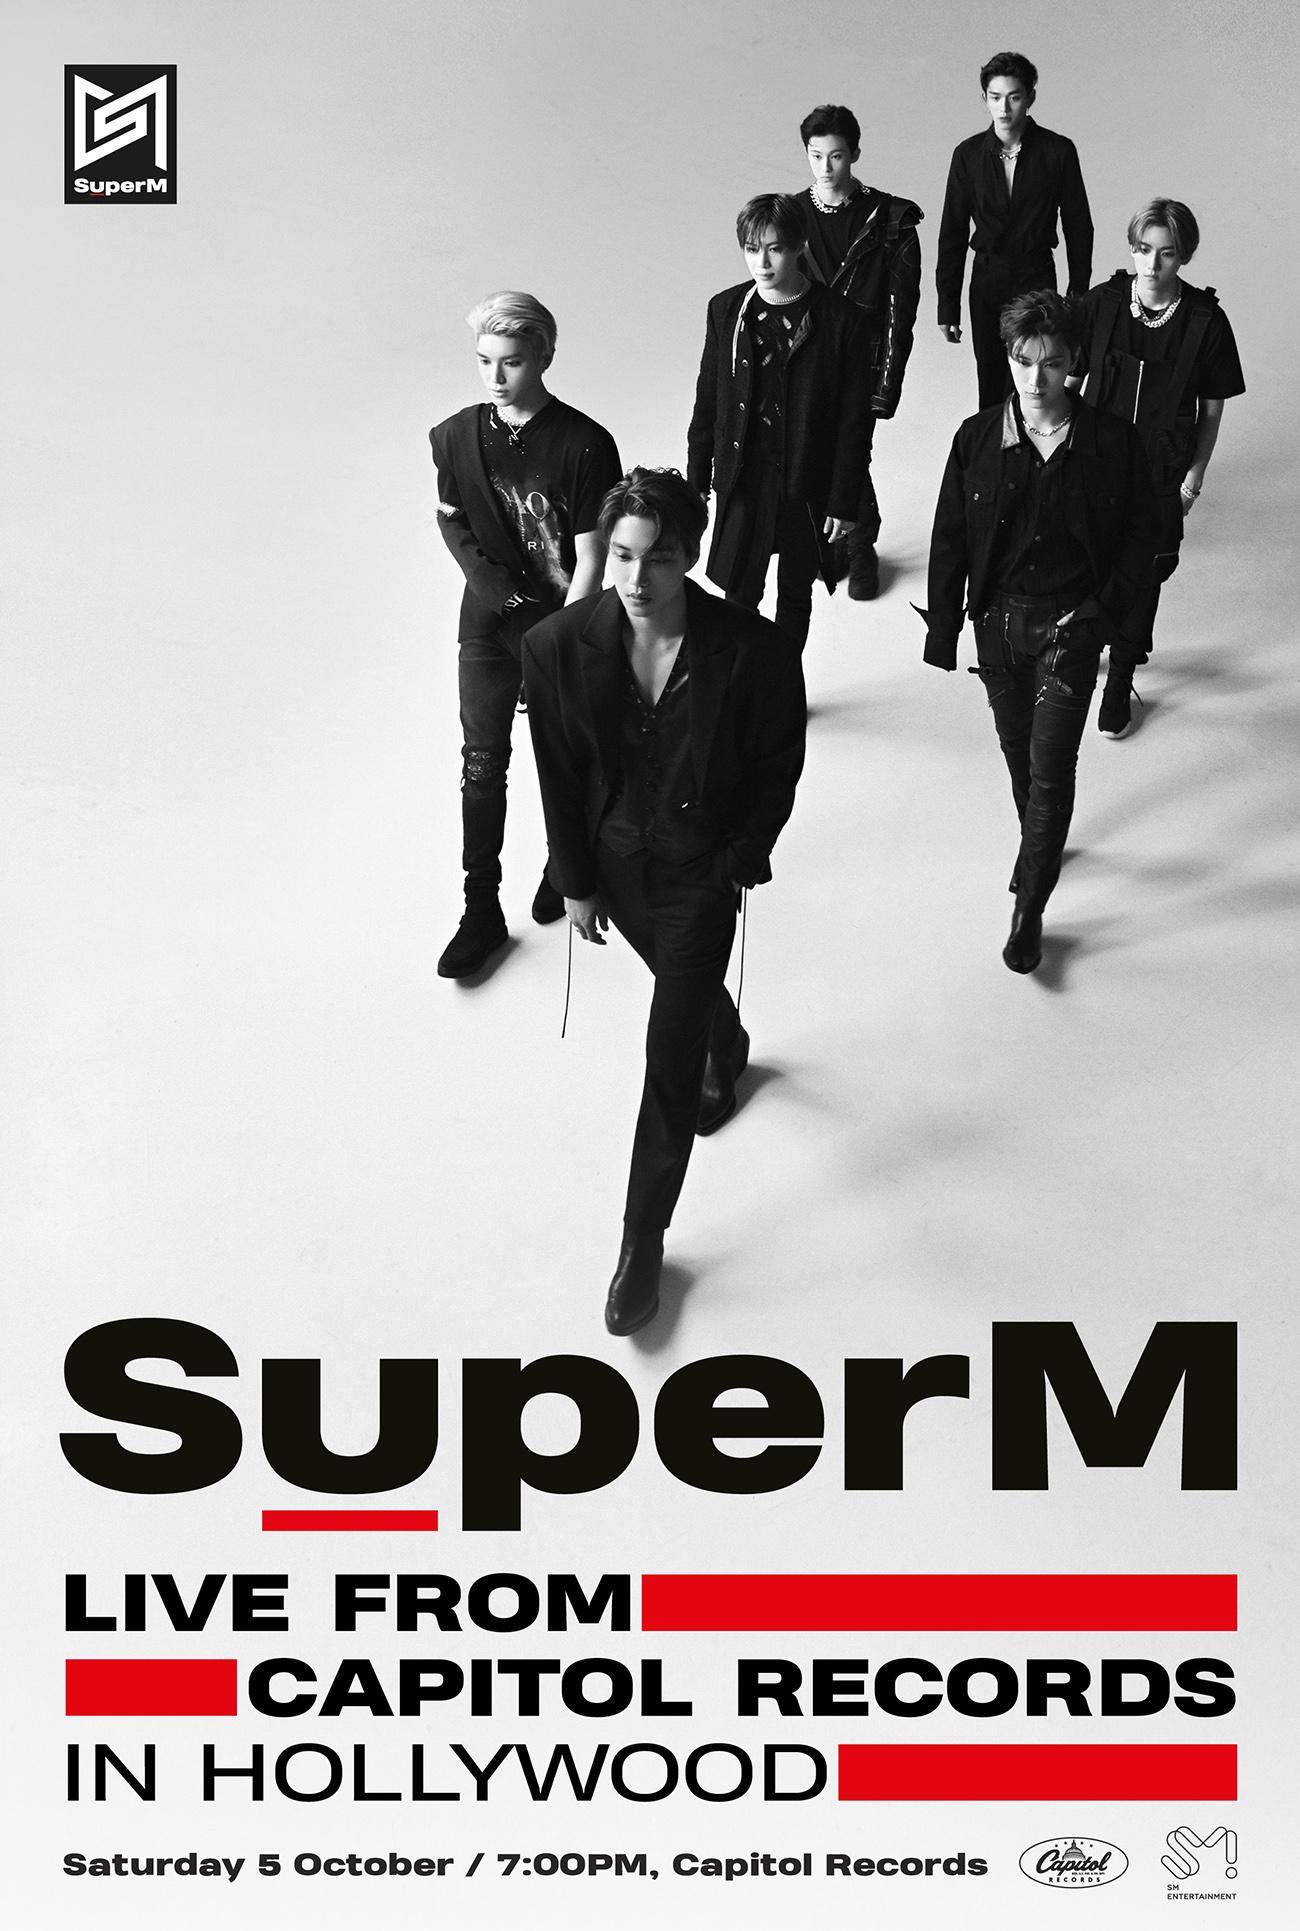 SuperM 쇼케이스 포스터.jpg